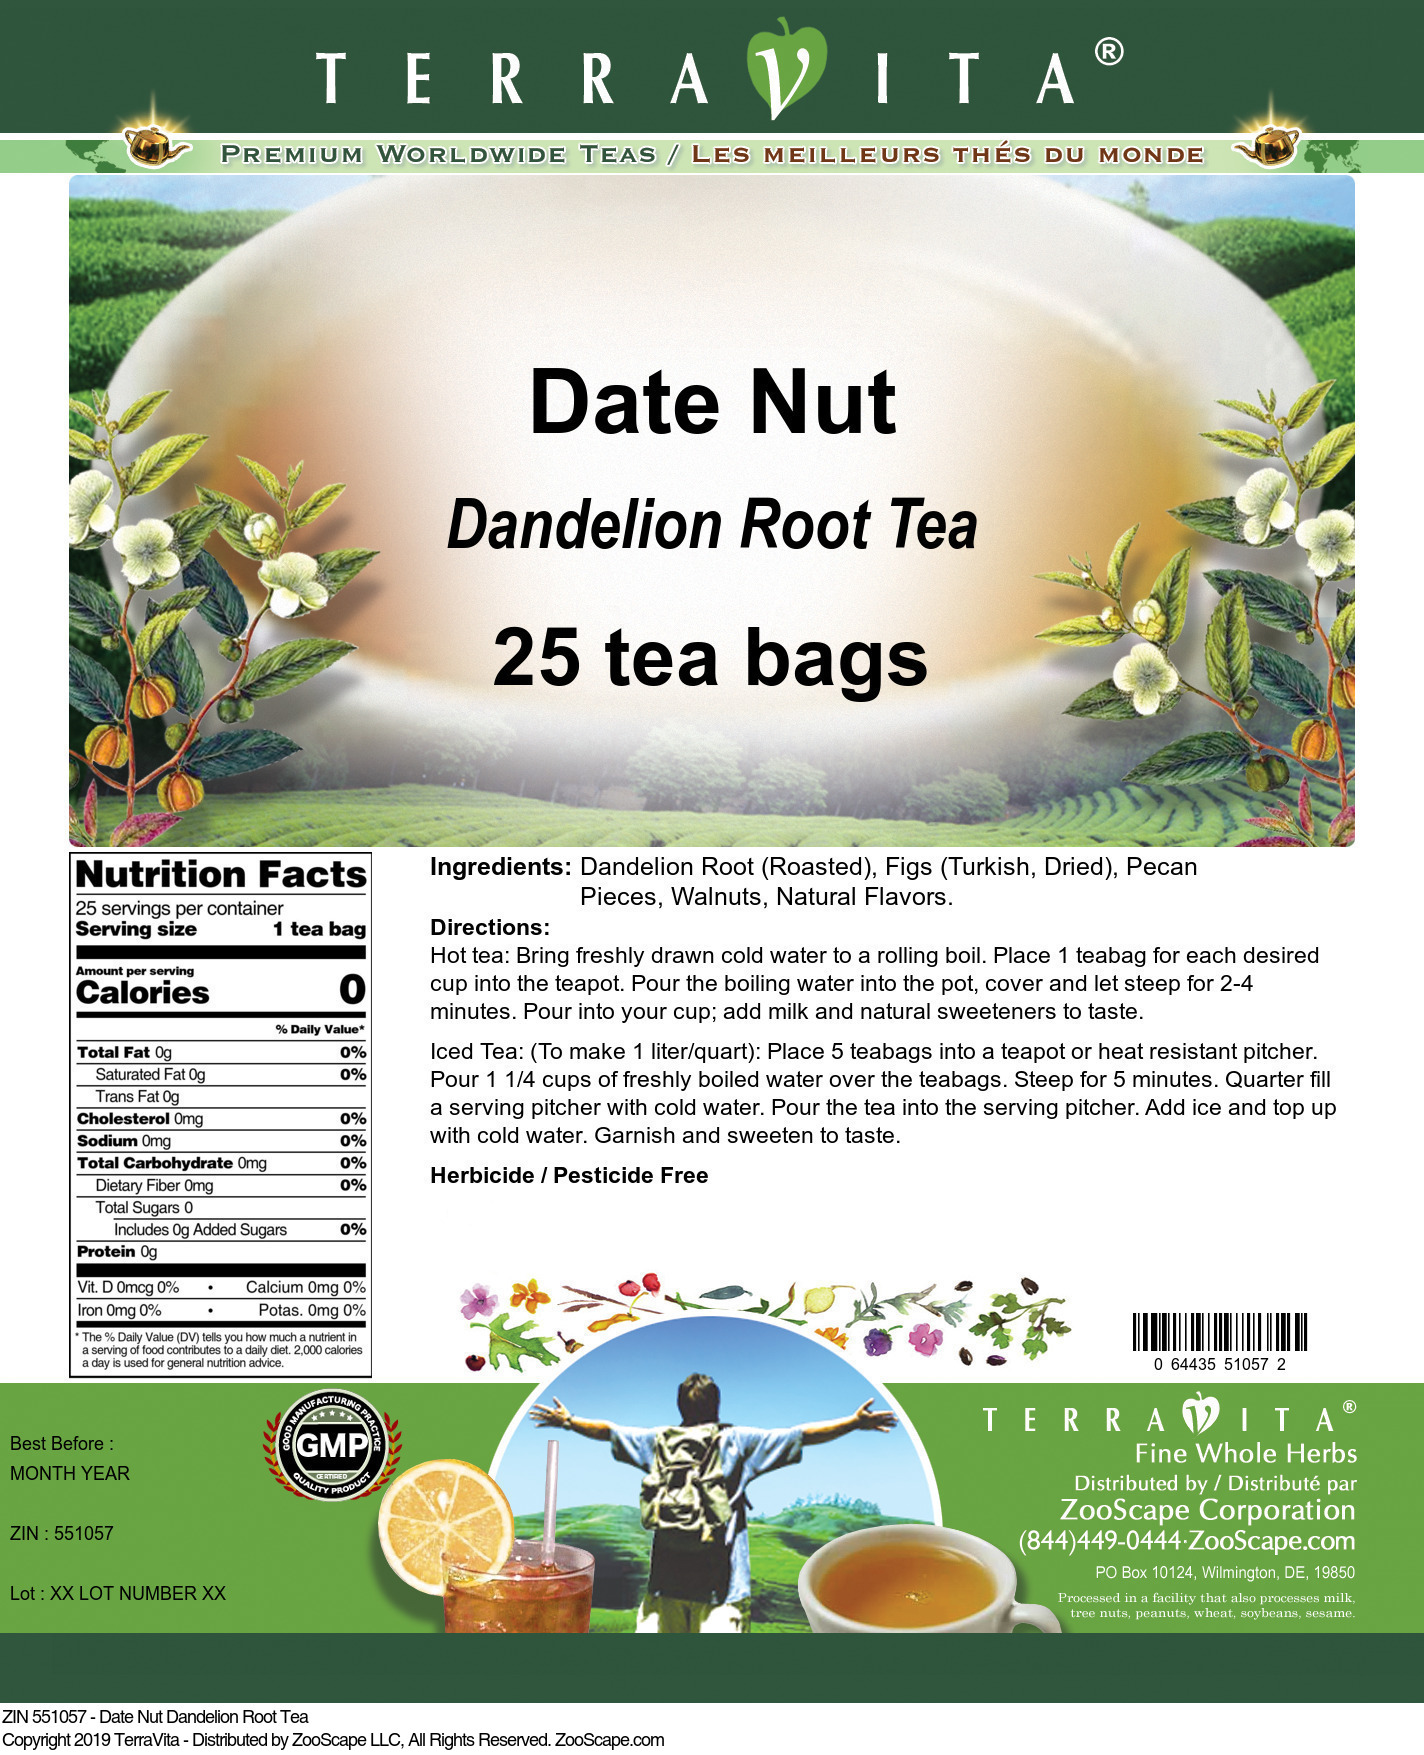 Date Nut Dandelion Root